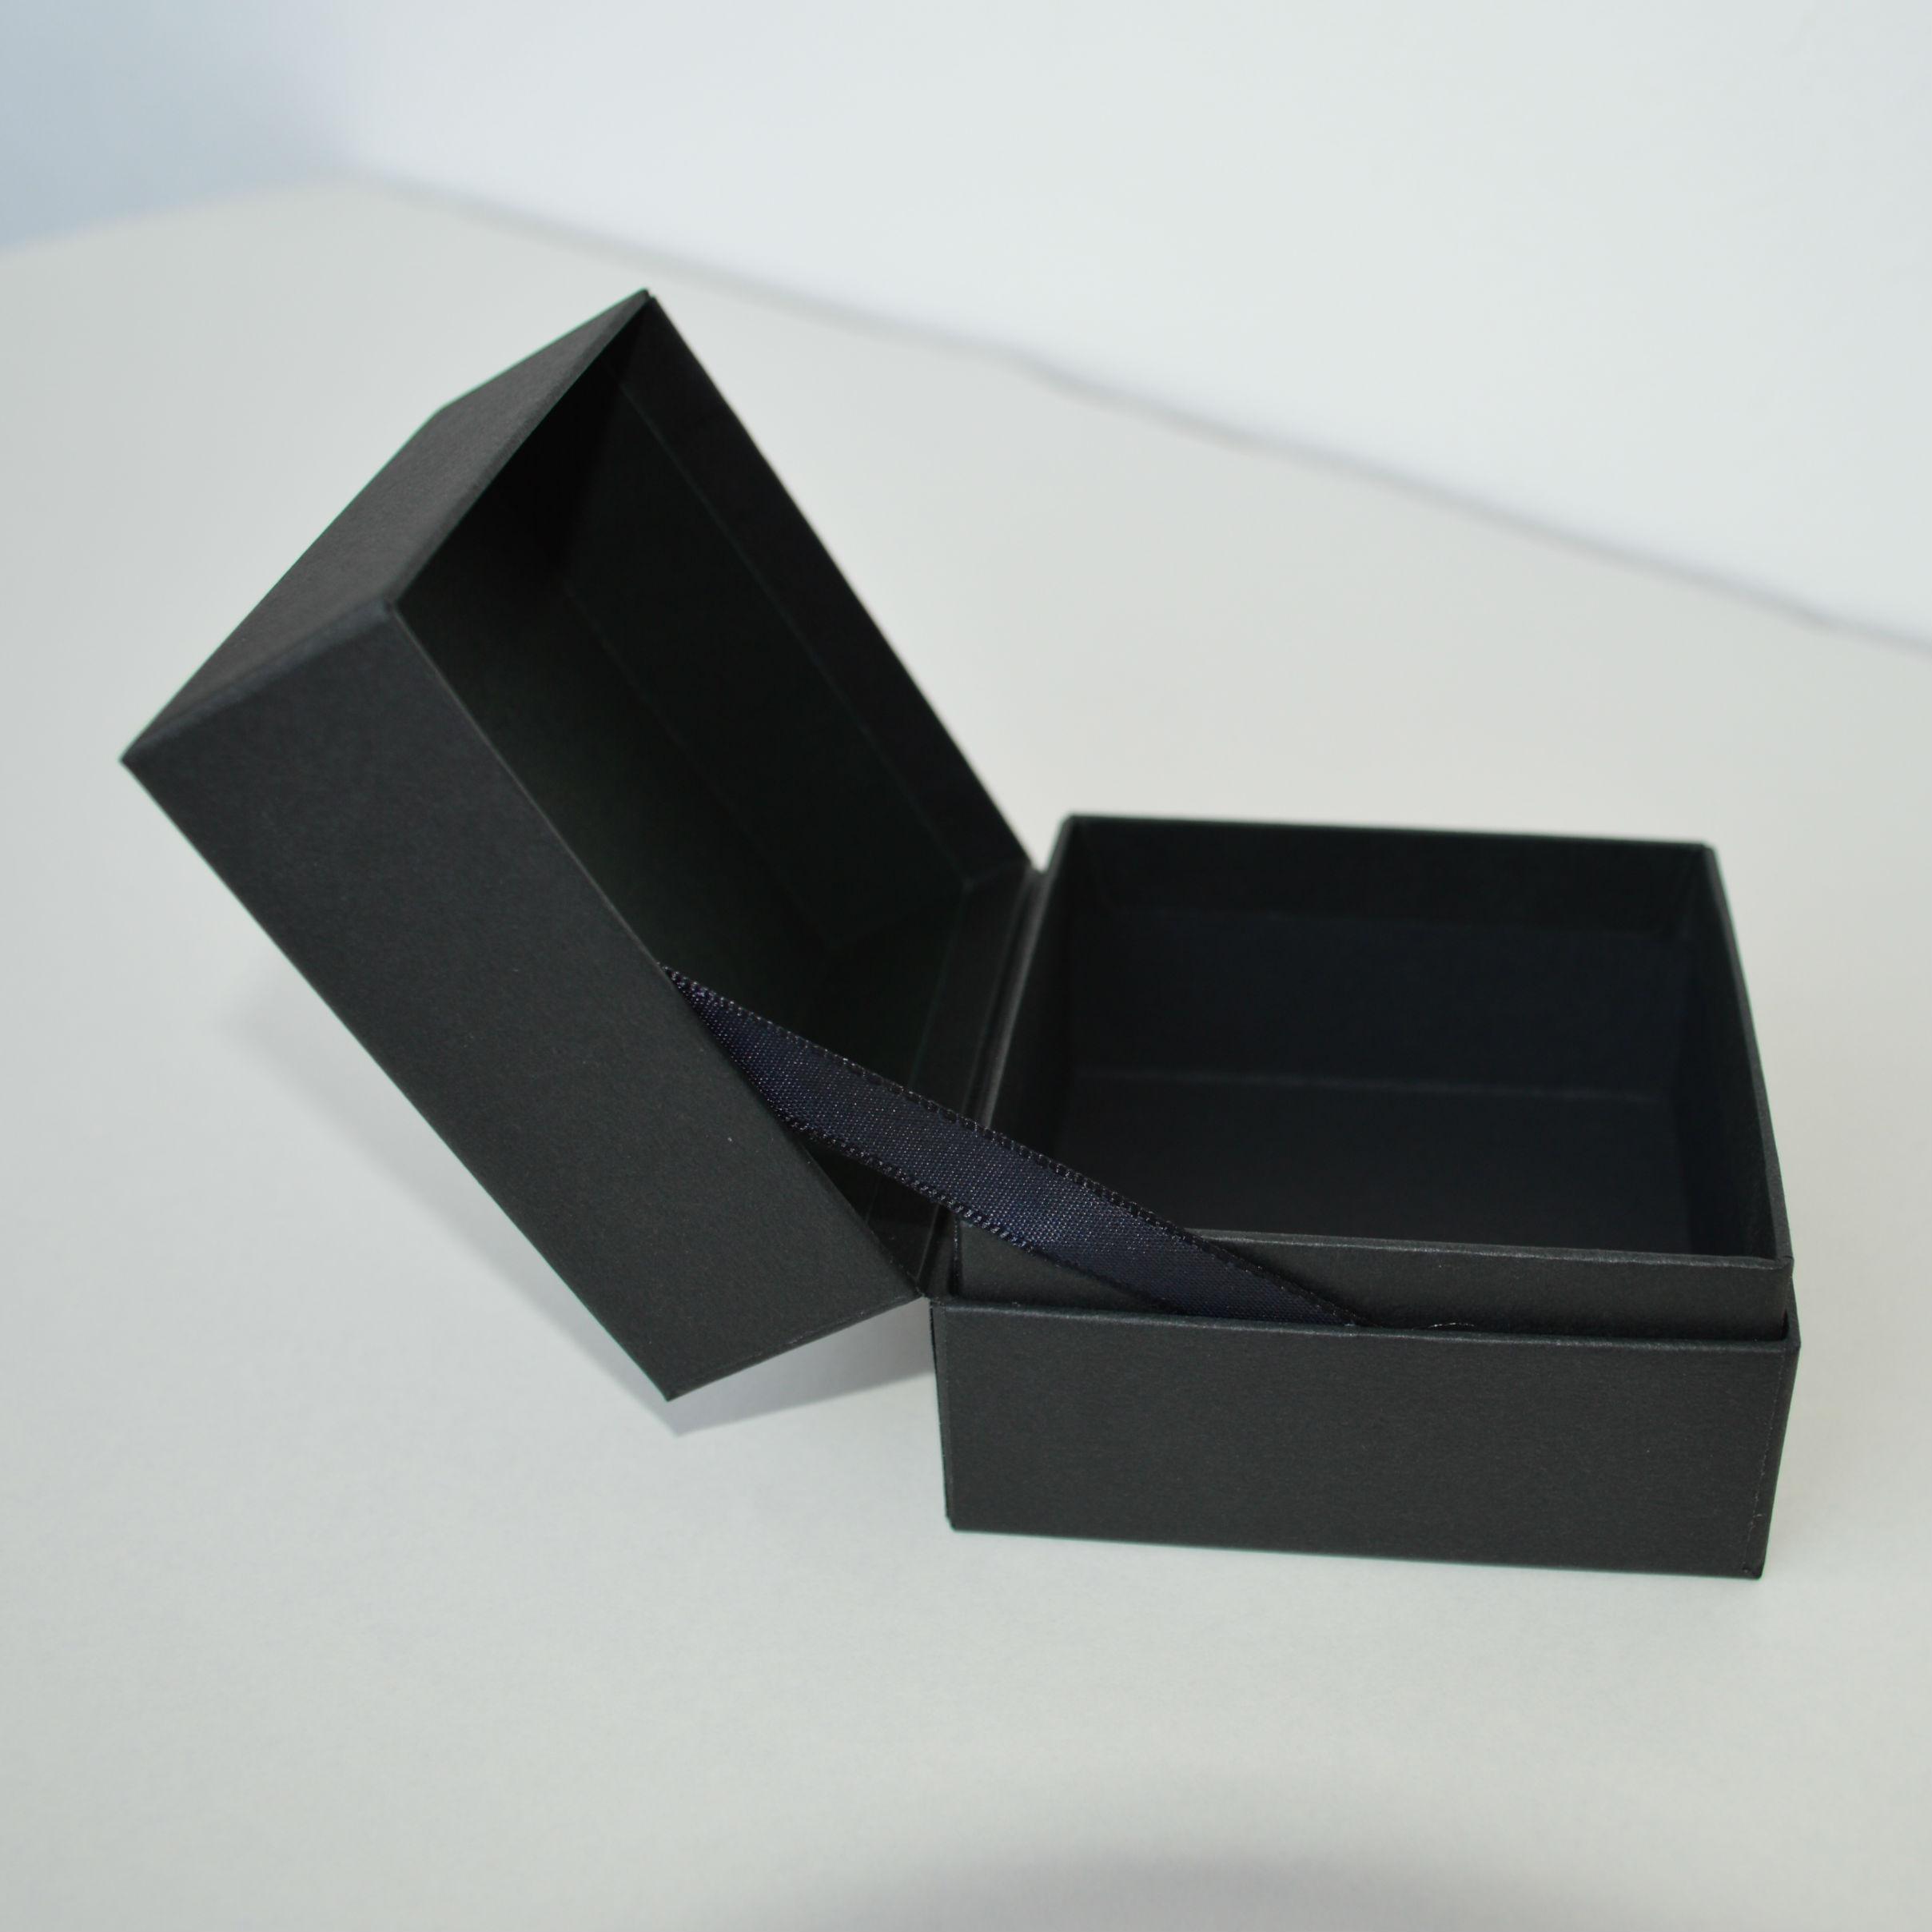 蝶番貼箱2